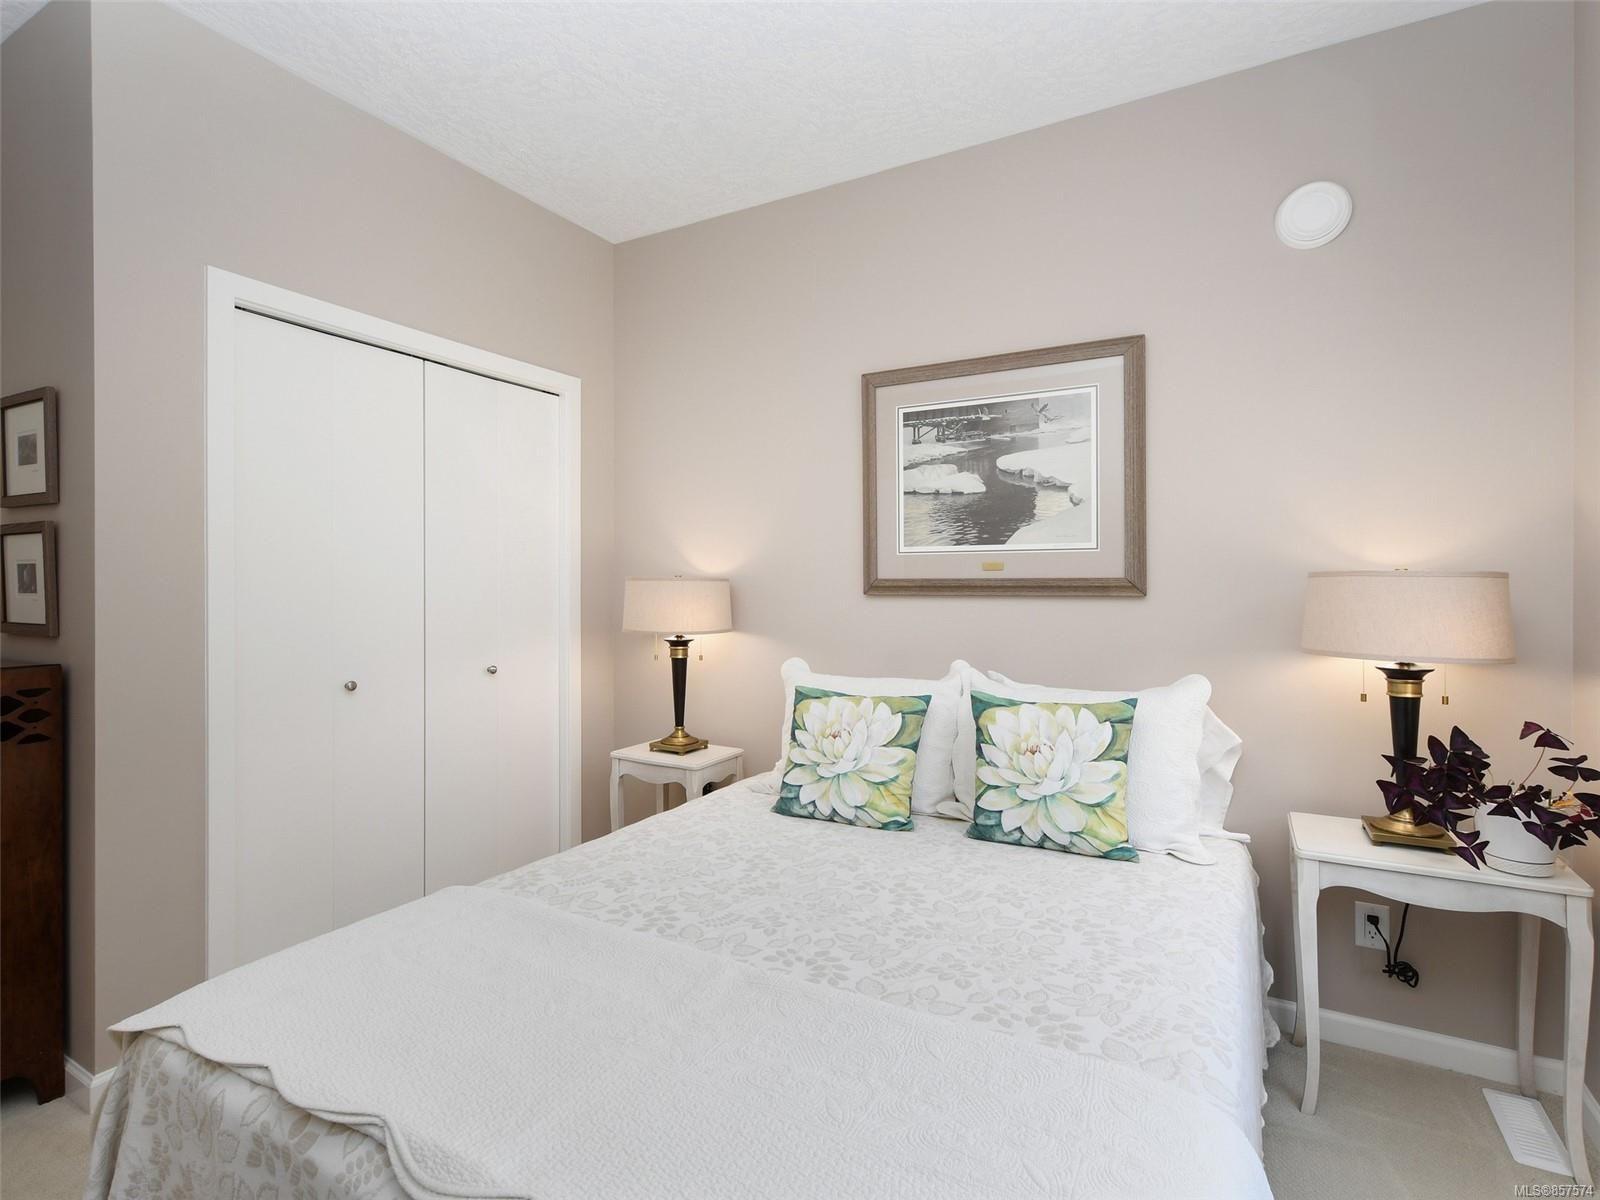 Photo 14: Photos: 6376 Shambrook Dr in : Sk Sunriver House for sale (Sooke)  : MLS®# 857574